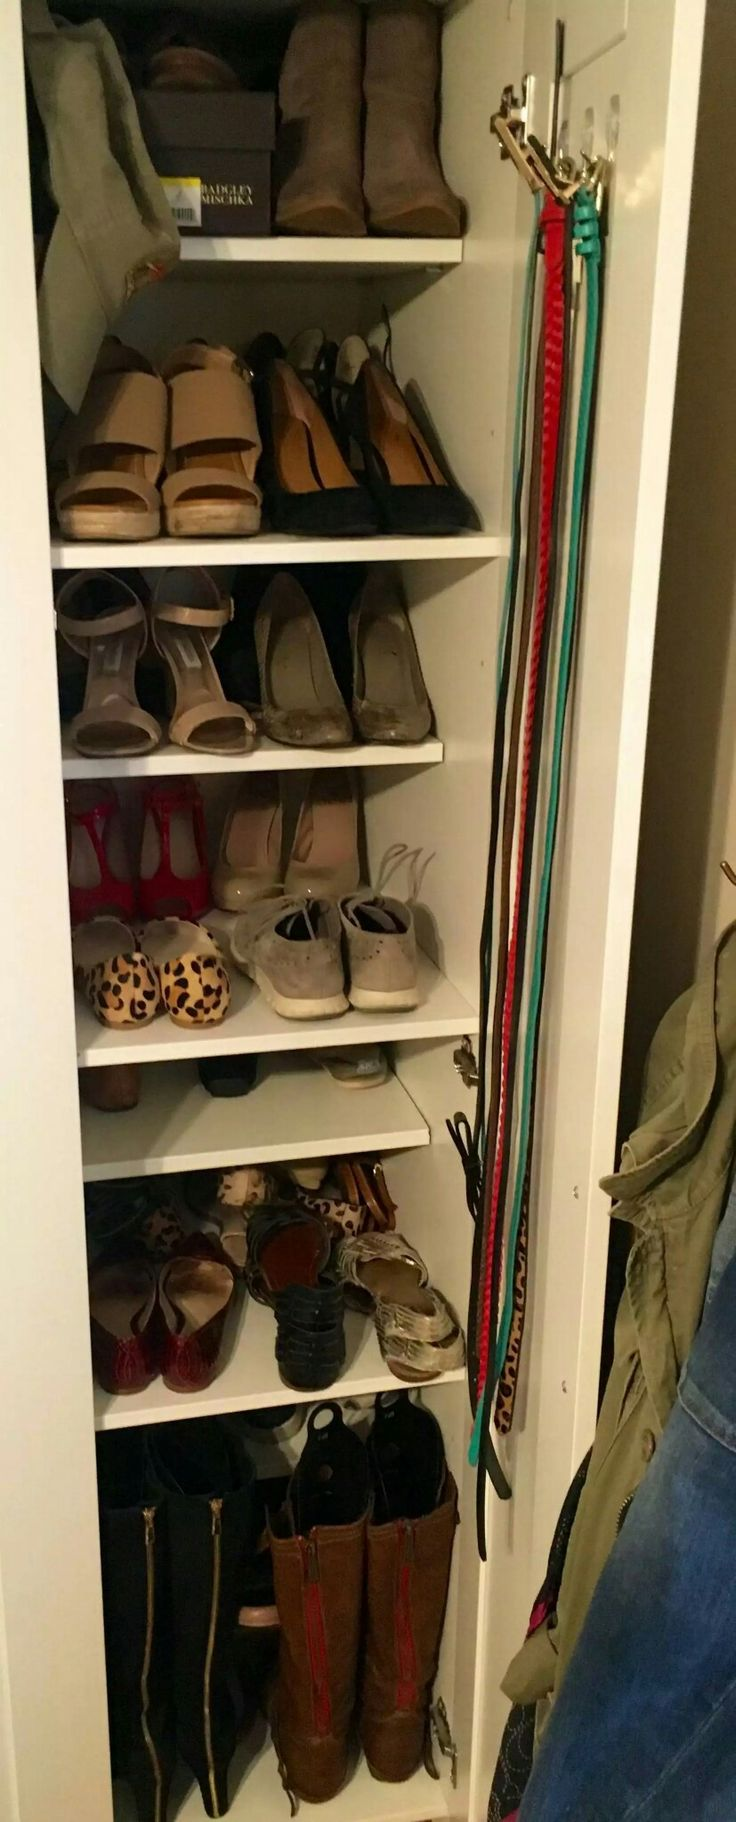 Brimnes 3 door wardrobe hack Add extra shelves  Comments at https://m.reddit.com/r/ikeahacks/comments/4ptk7w/customizing_brimnes_wardrobe/ #diy